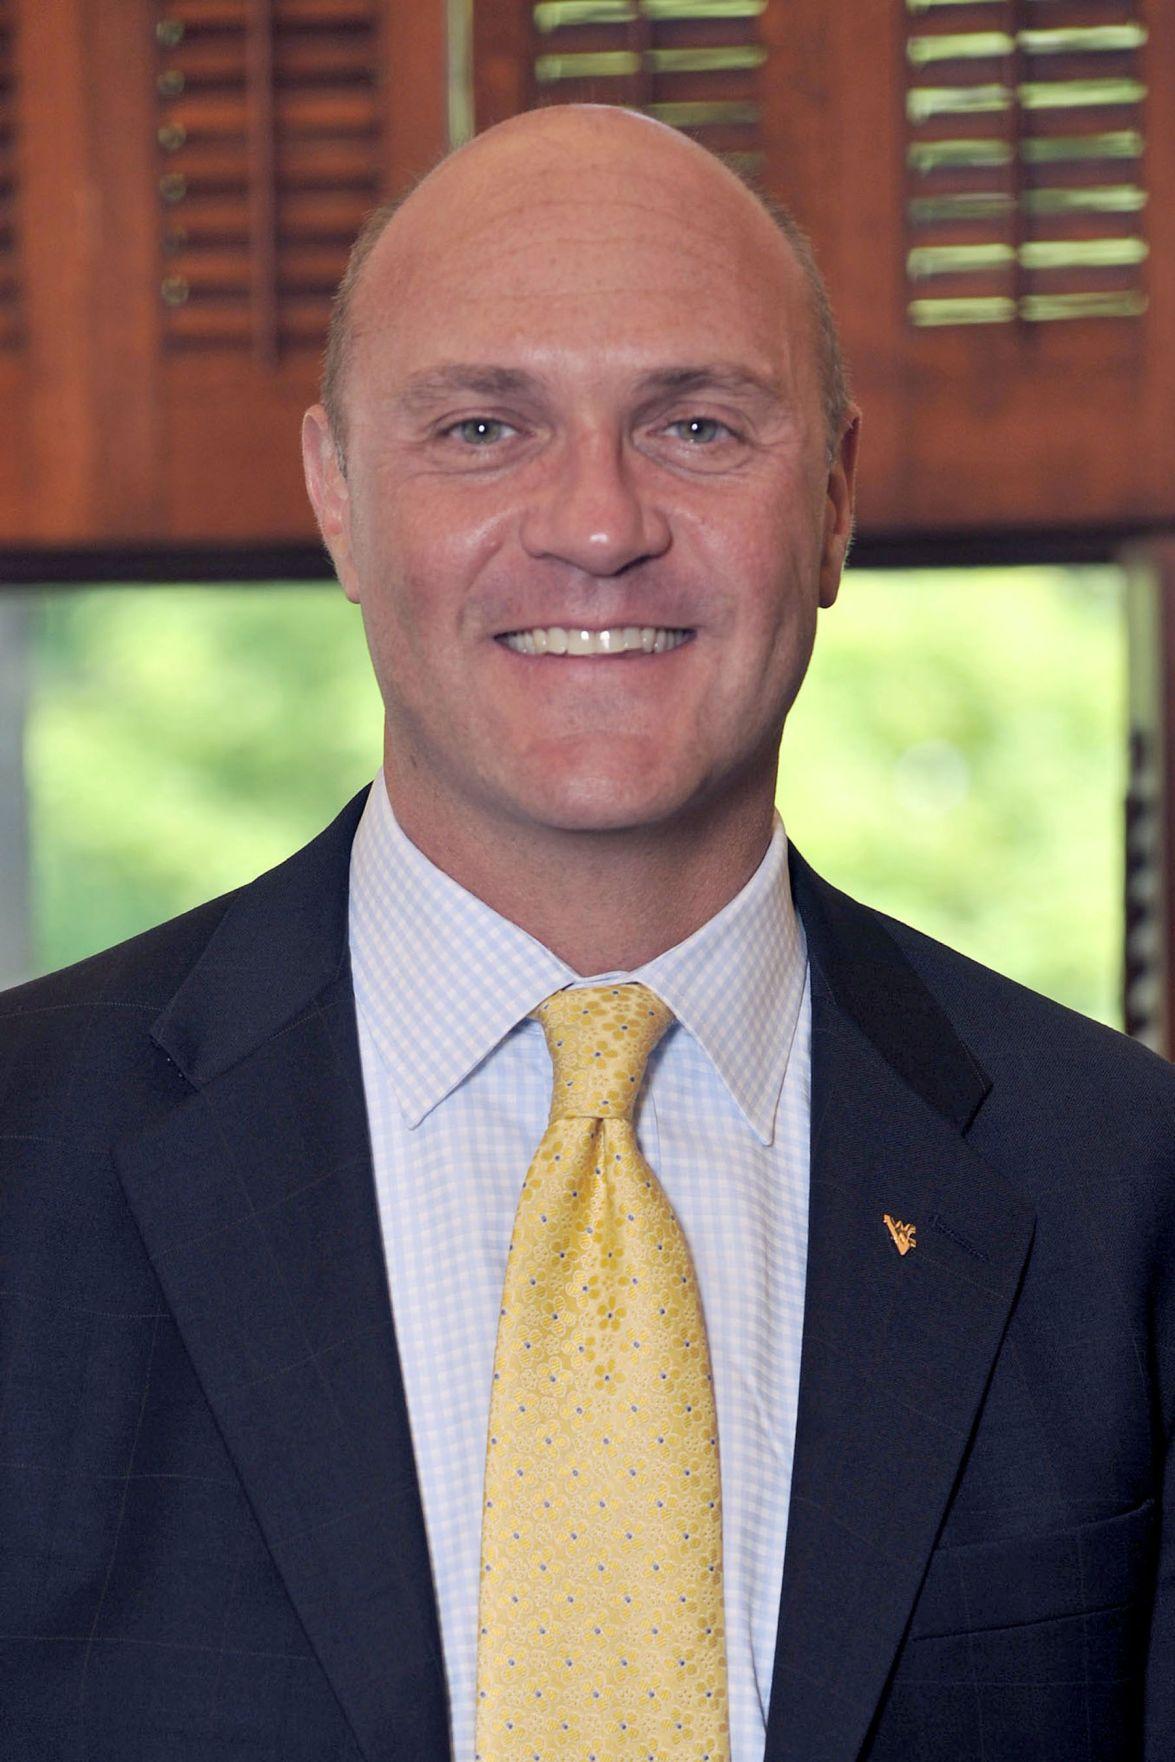 Clemson president James Clements